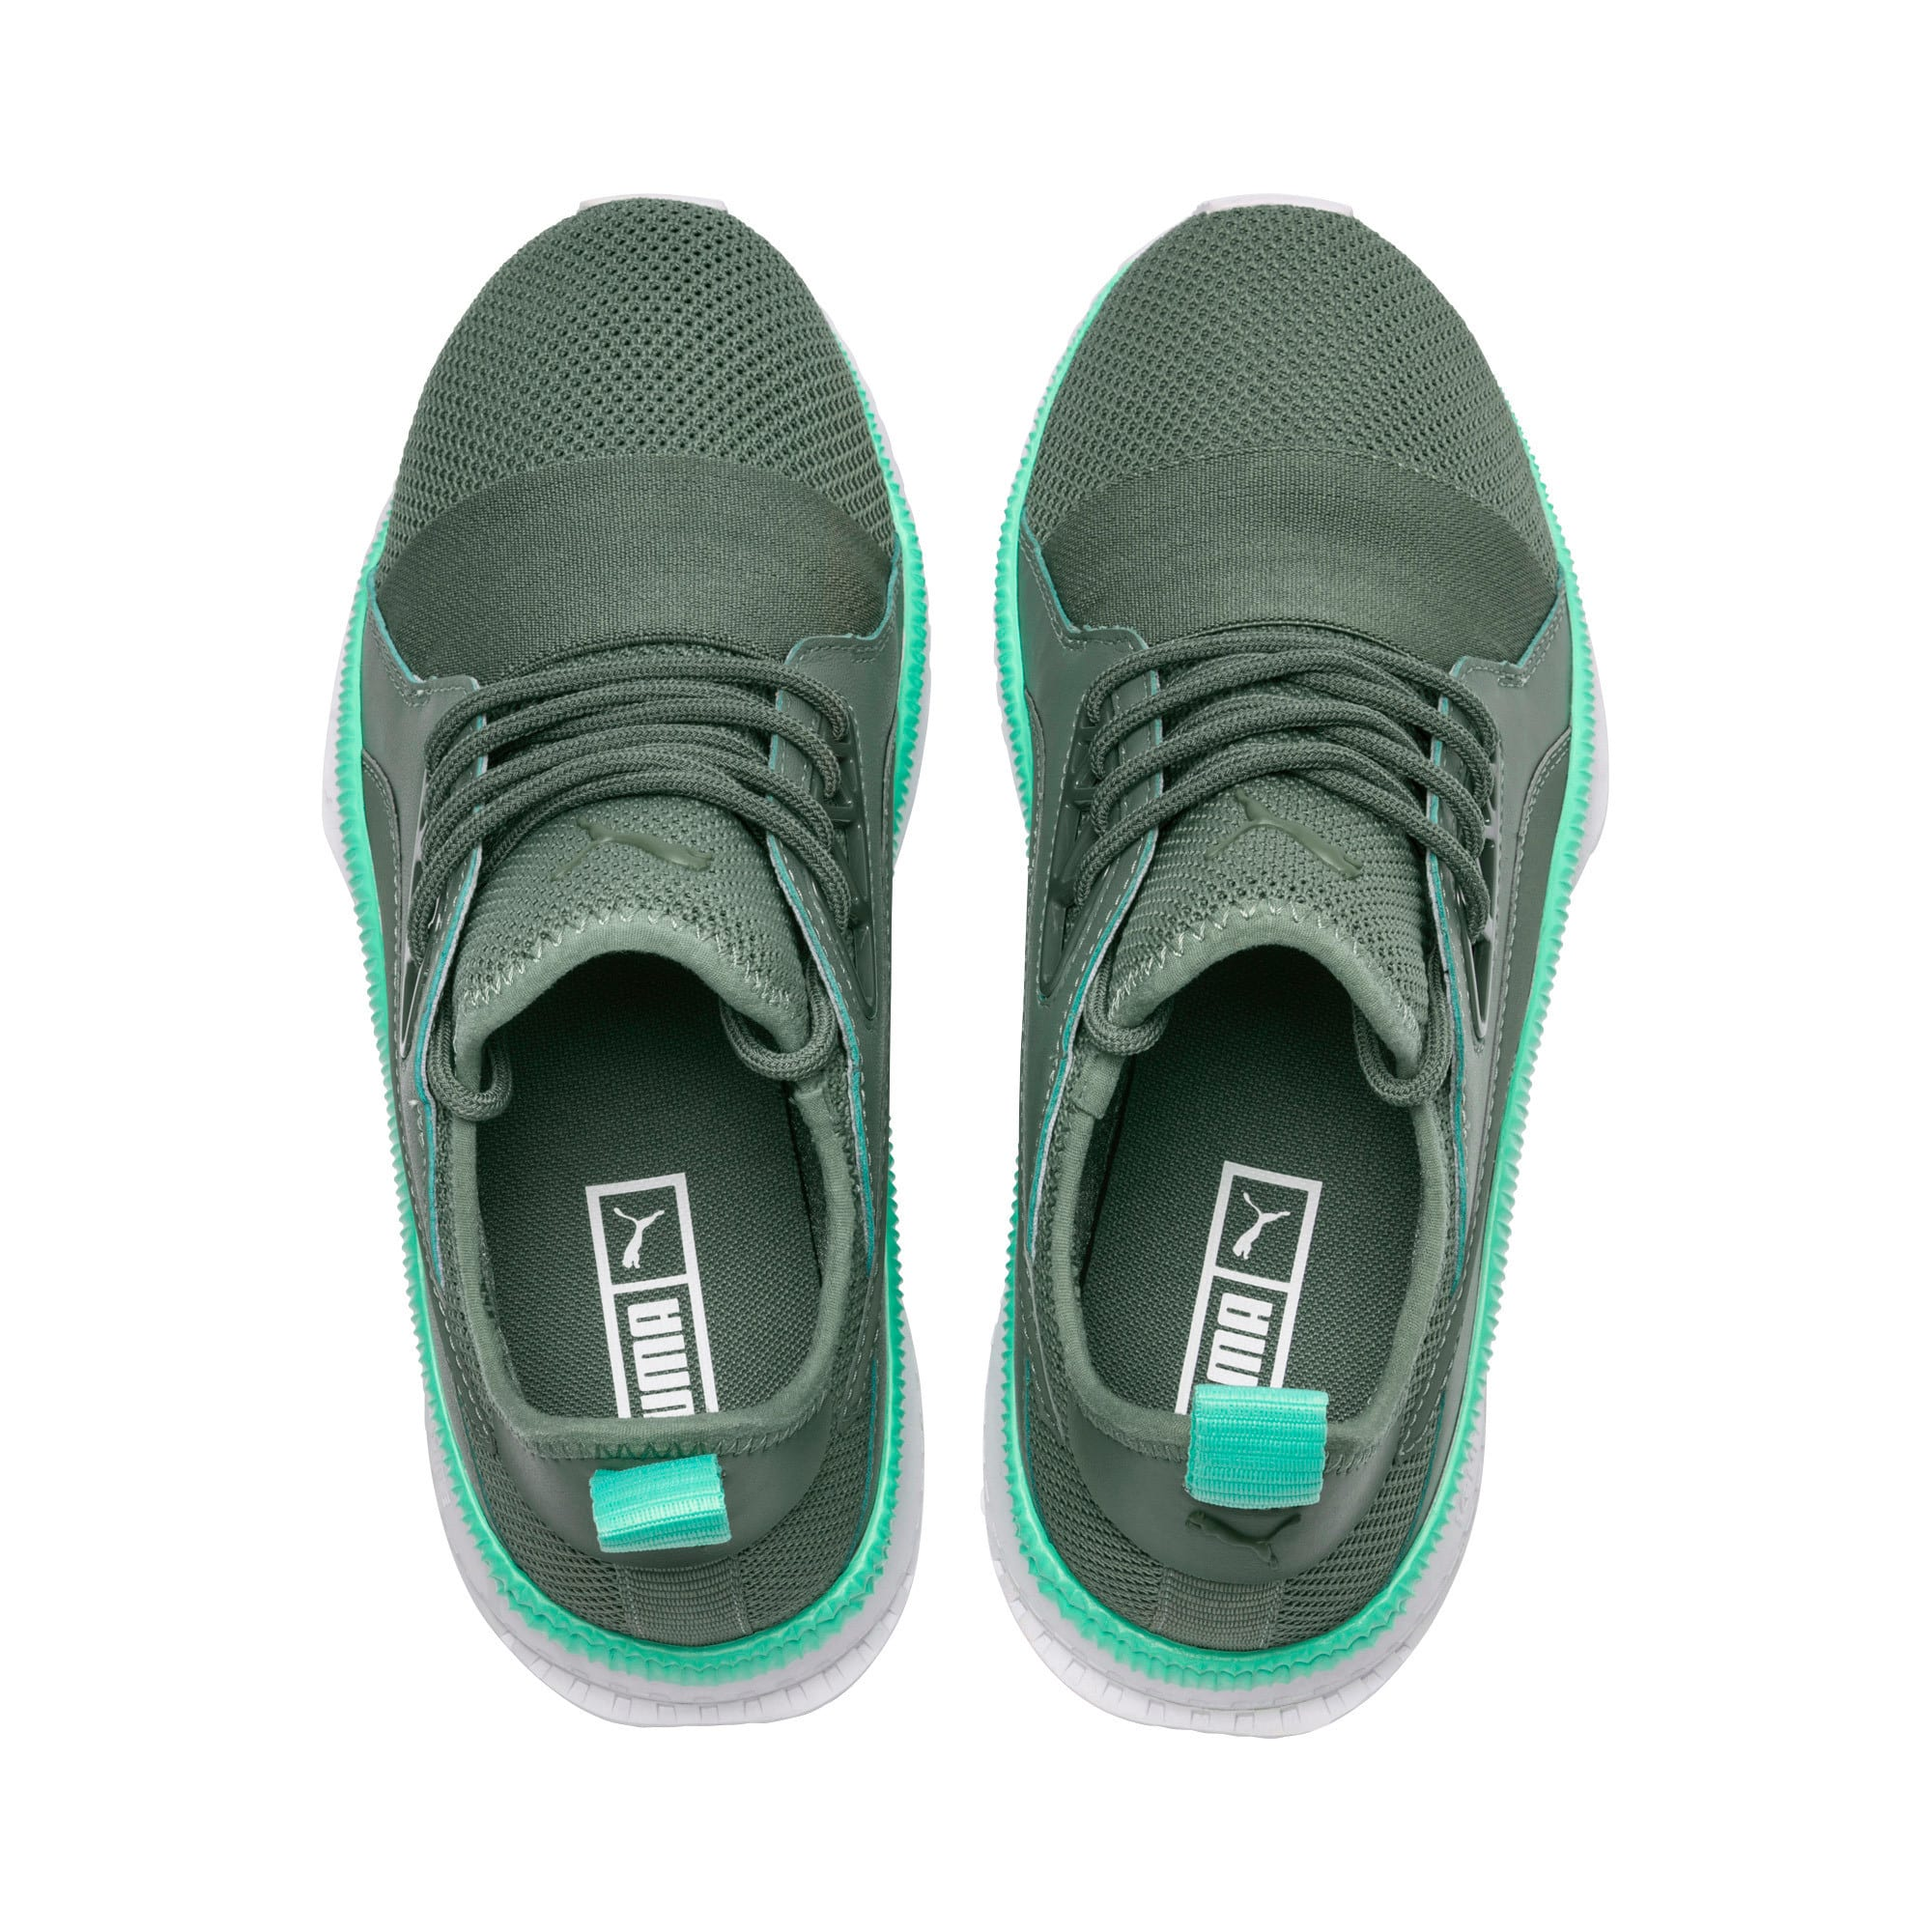 Thumbnail 6 of TSUGI Apex Jewel Street 2 Women's Sneakers, Laurel Wreath-Biscay Green, medium